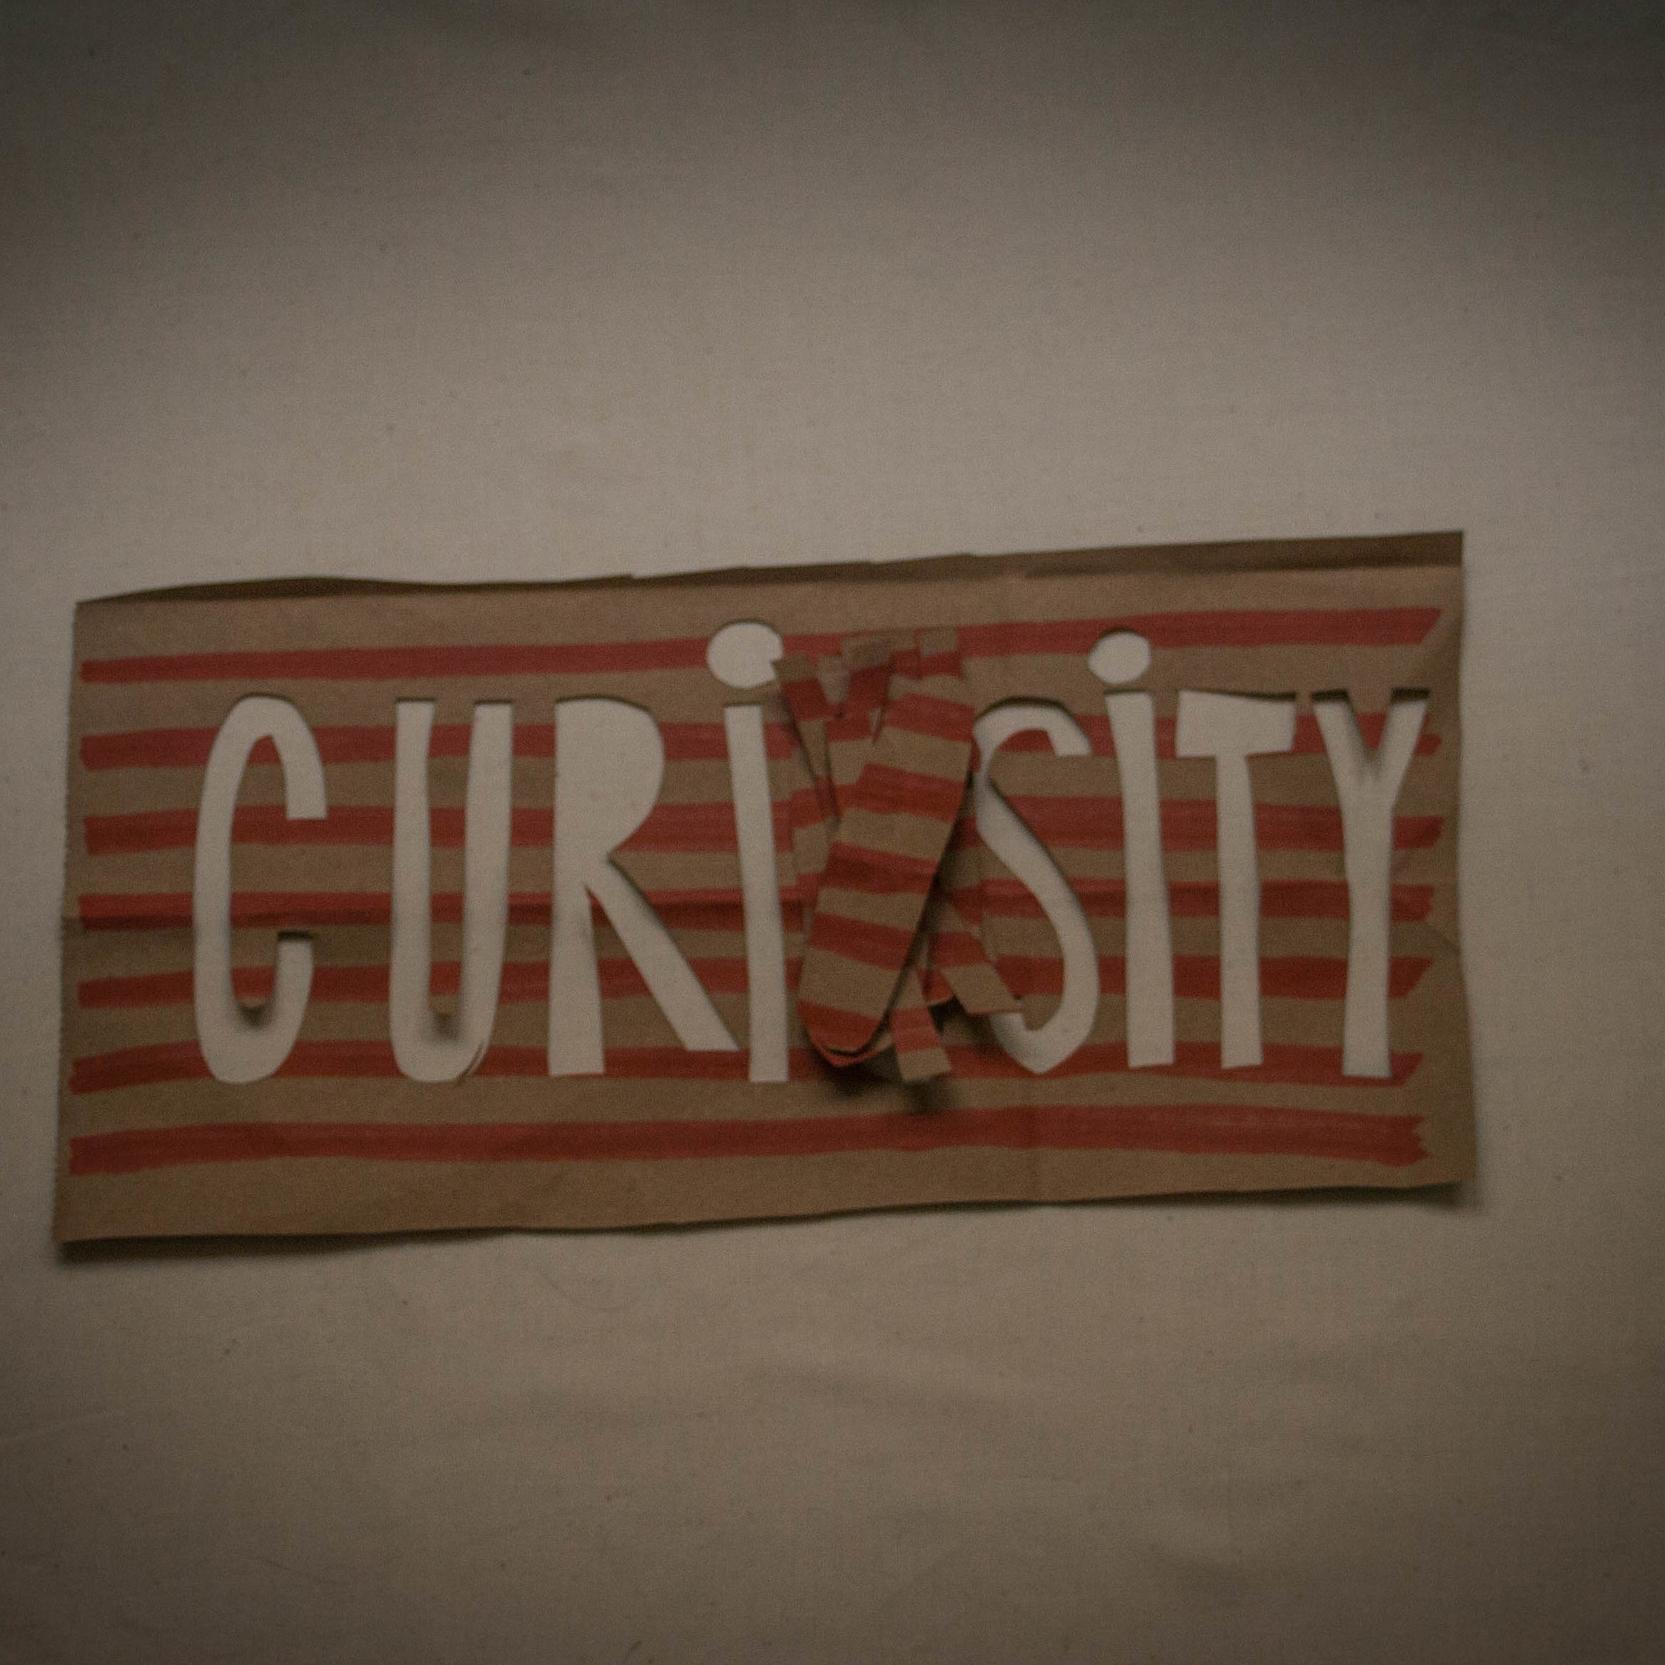 Let Girls Learn_Curiousity-11.jpg